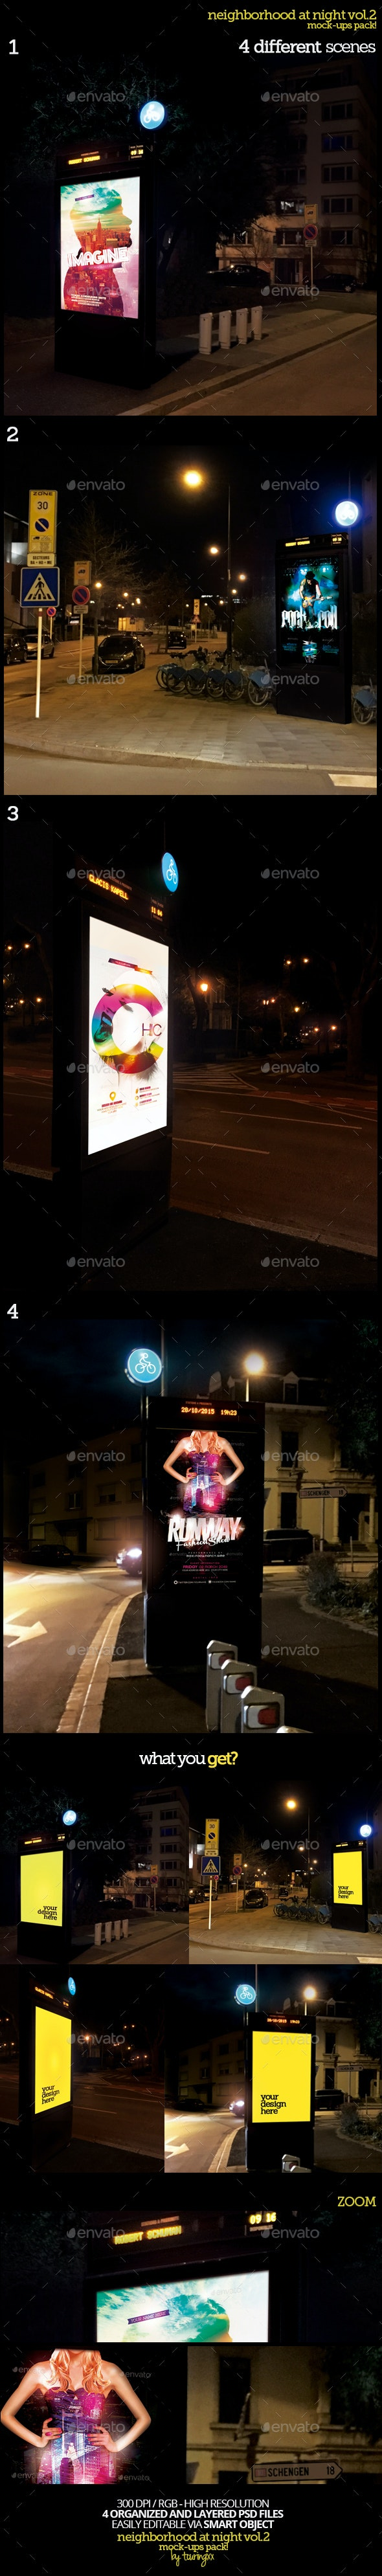 Neighborhood At Night Vol.2 Mock-Ups Pack - Product Mock-Ups Graphics